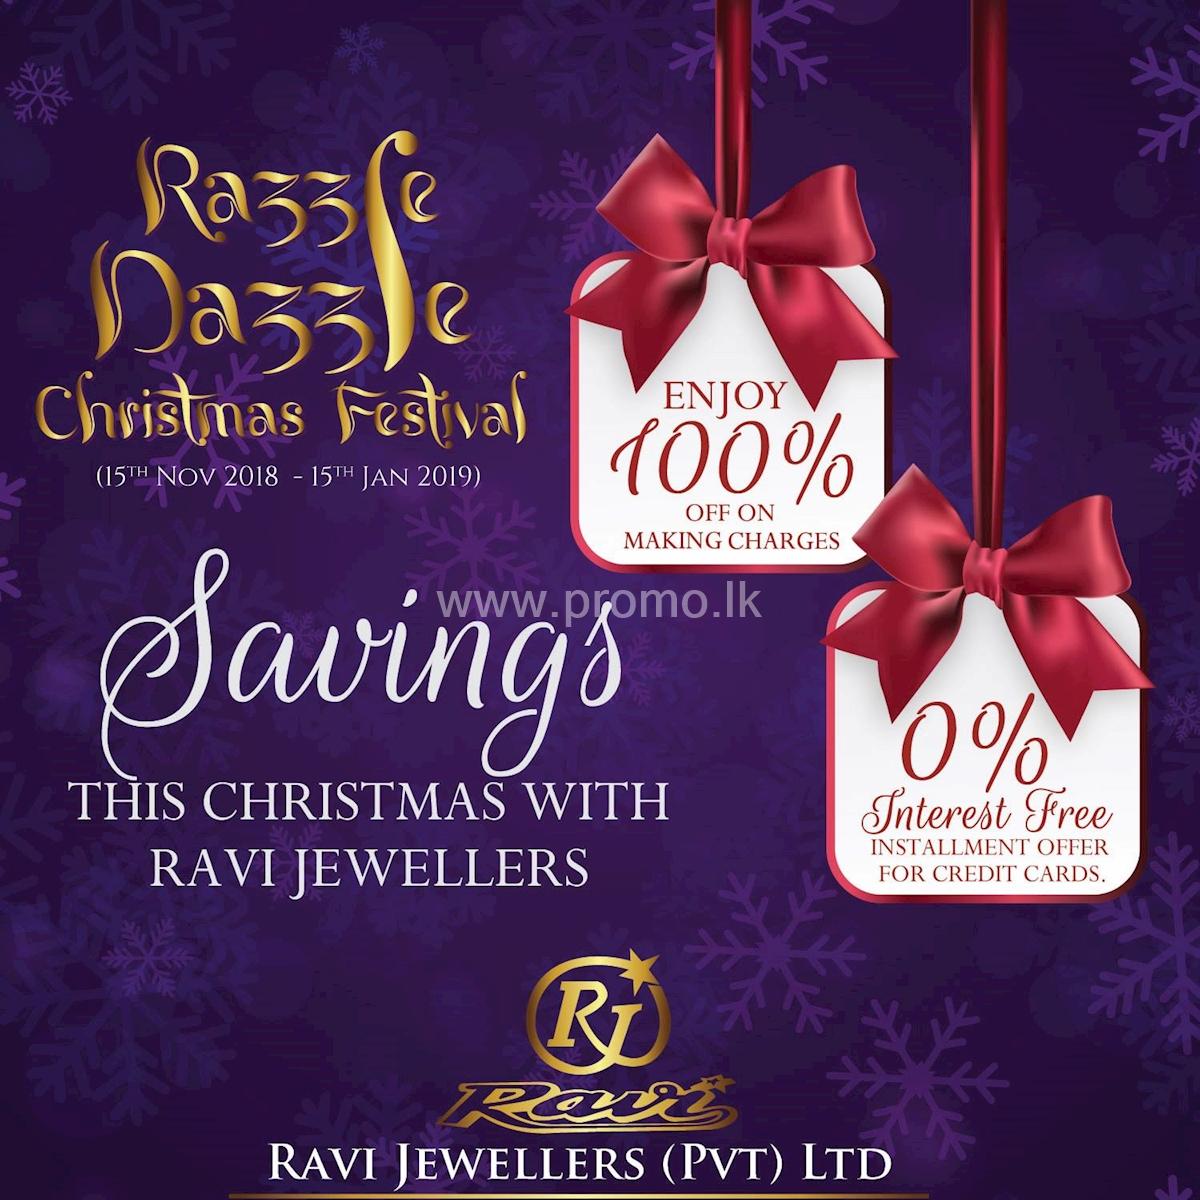 Razzle Dazzle Christmas Festival with Ravi Jewellers